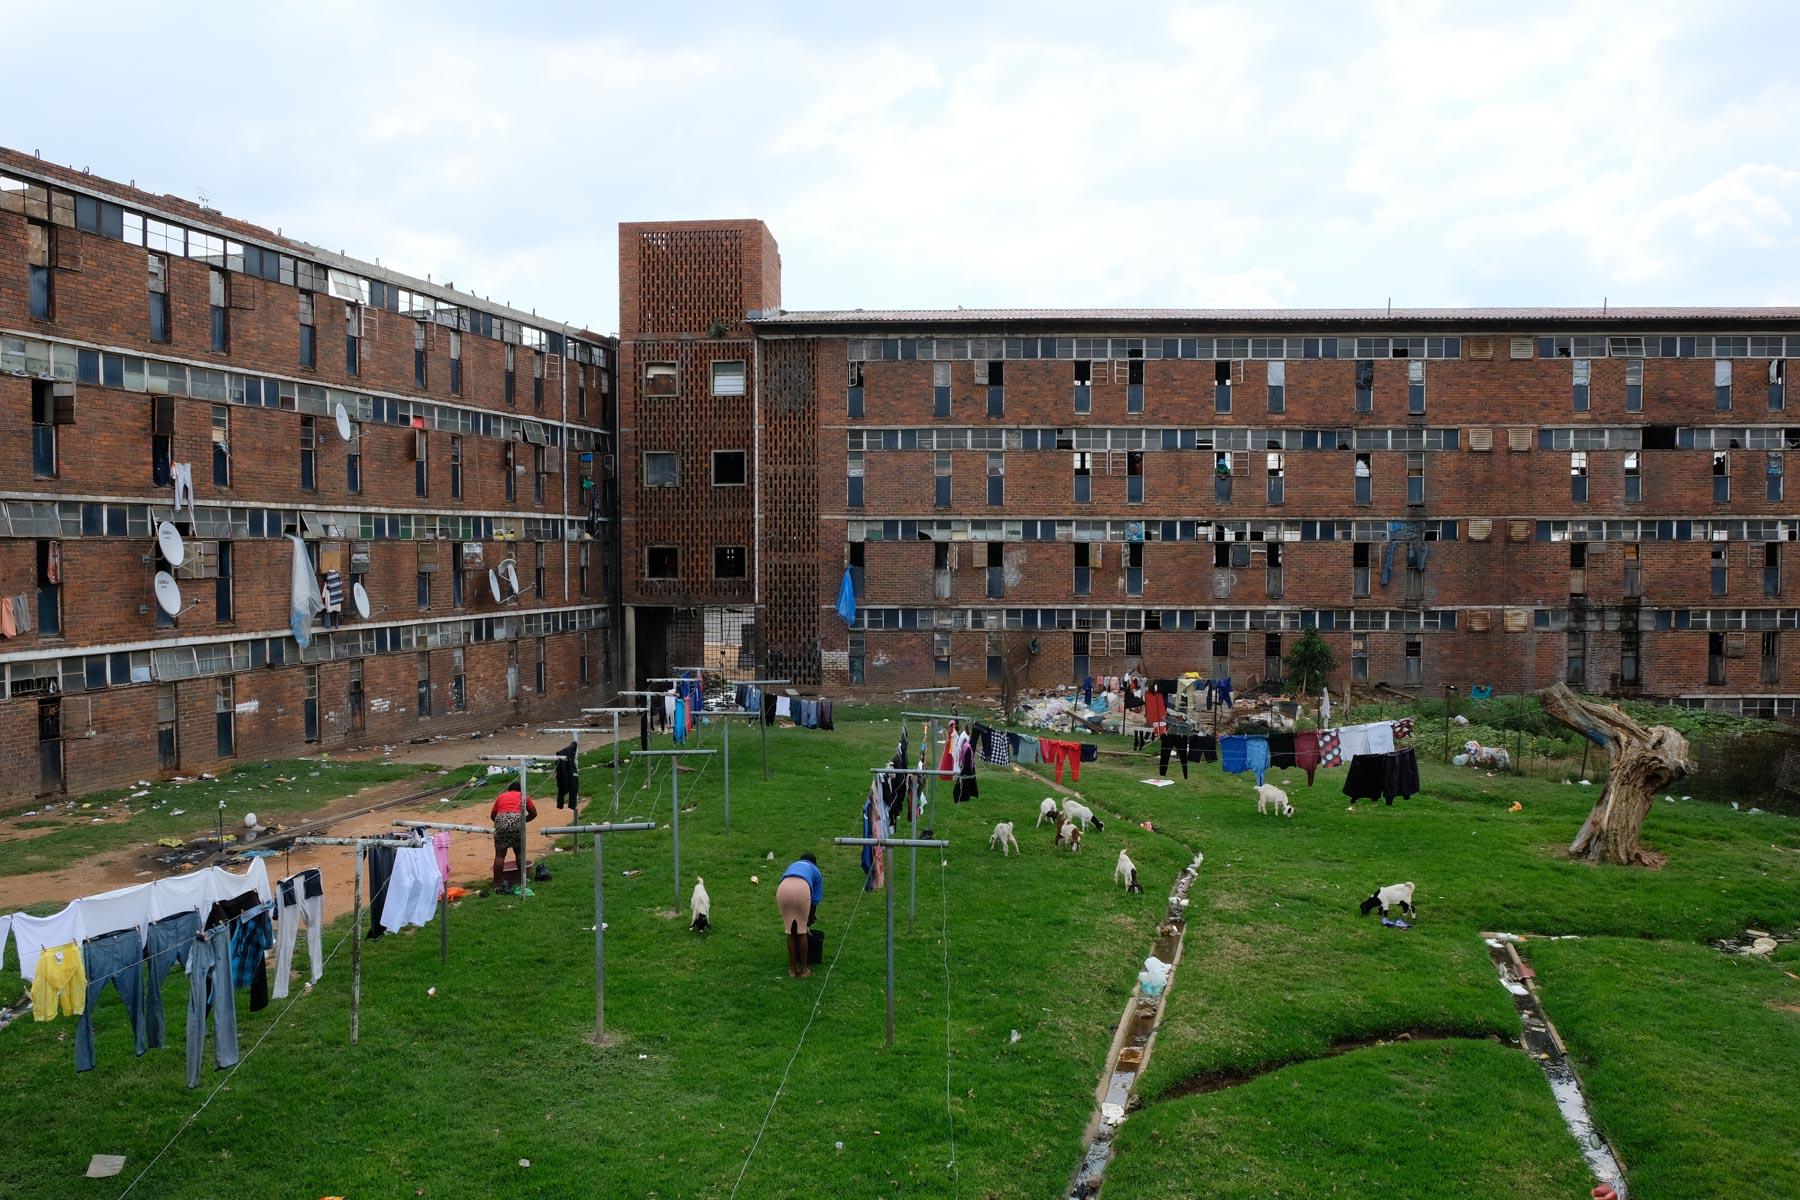 1 April 2020: The Madala men's hostel in Alex.